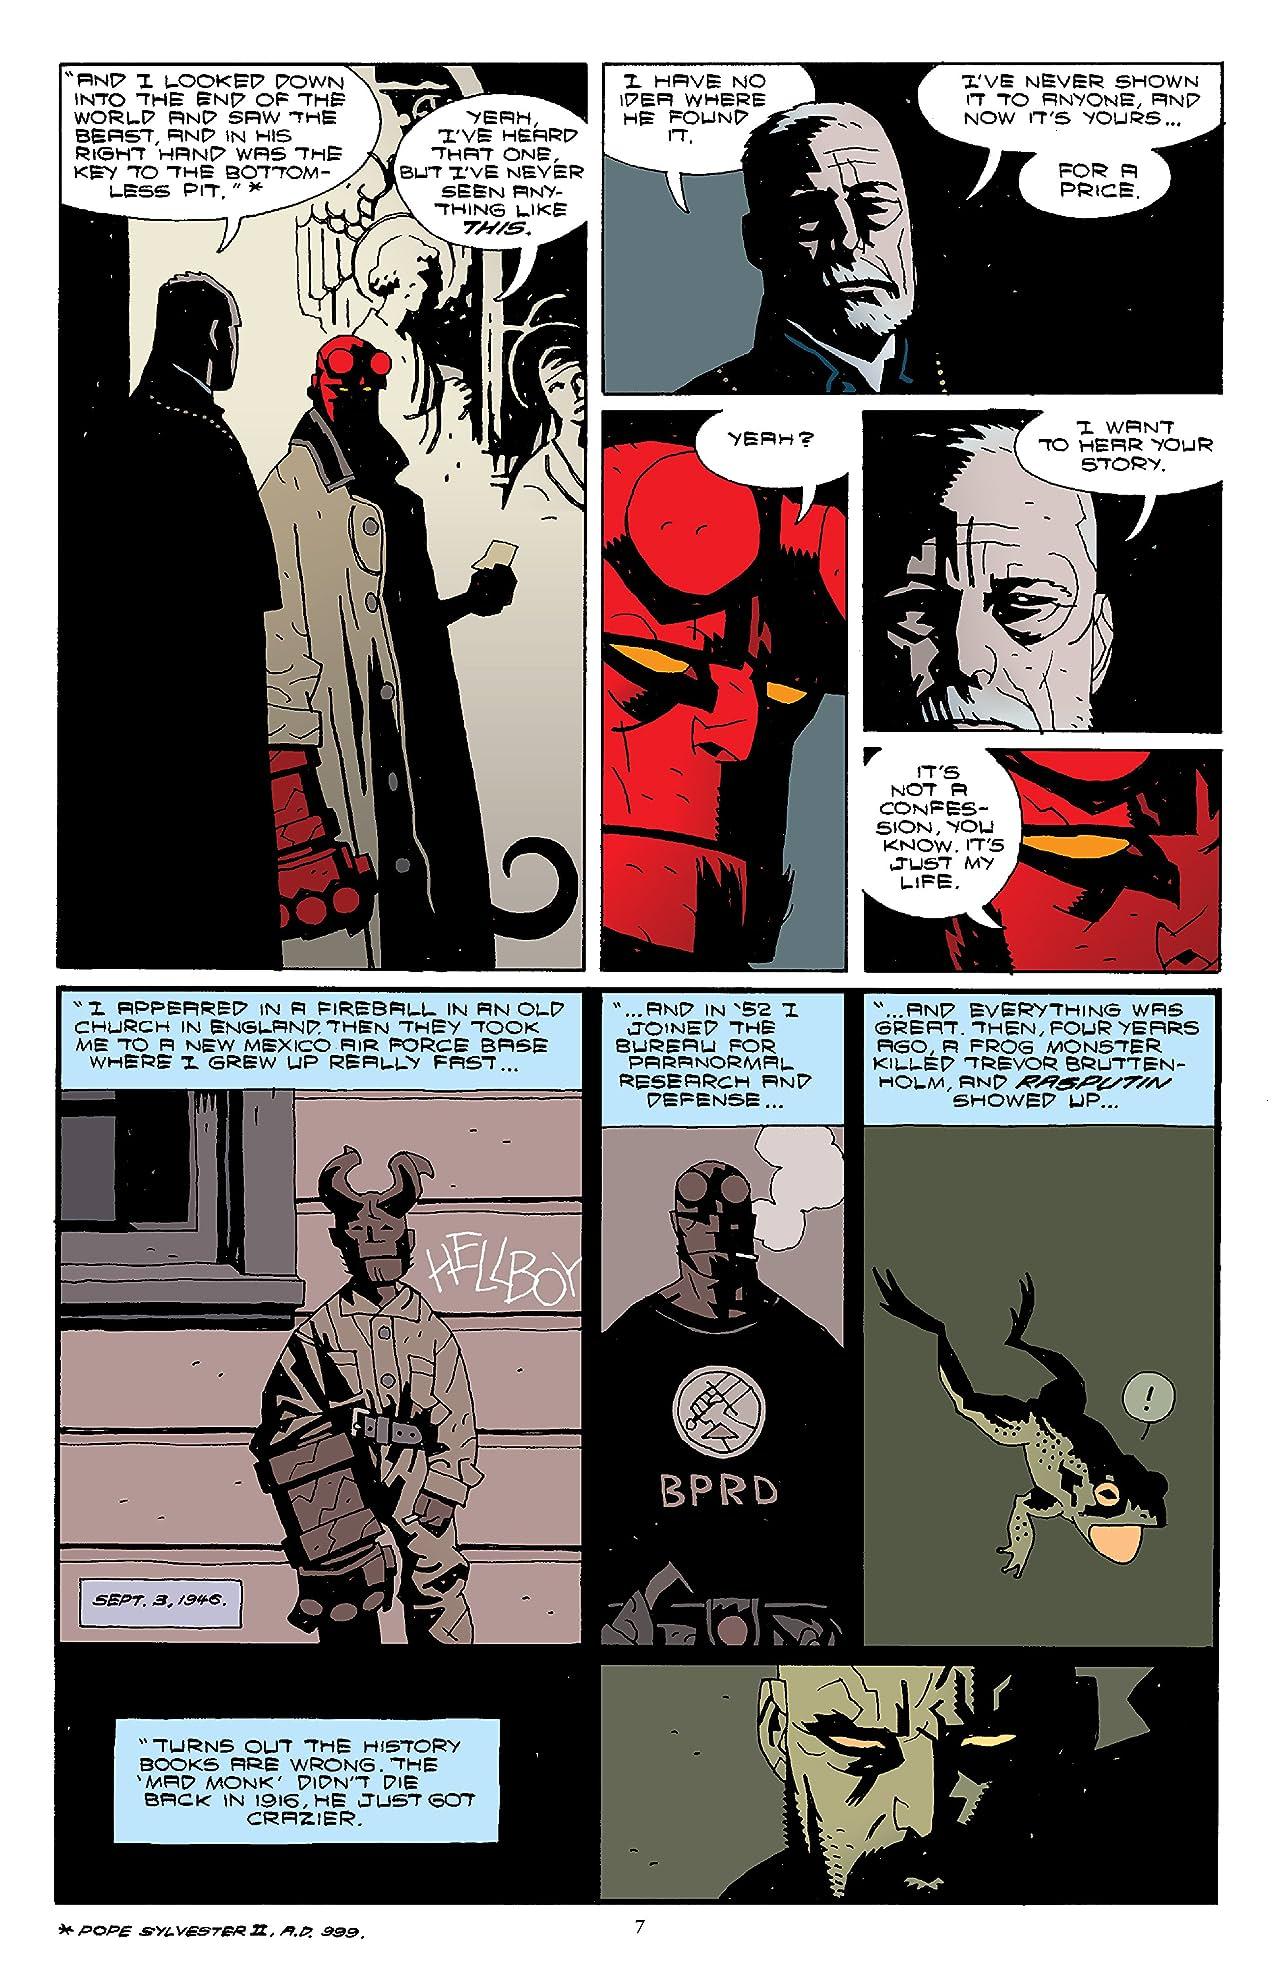 Hellboy Omnibus Vol. 2: Strange Places